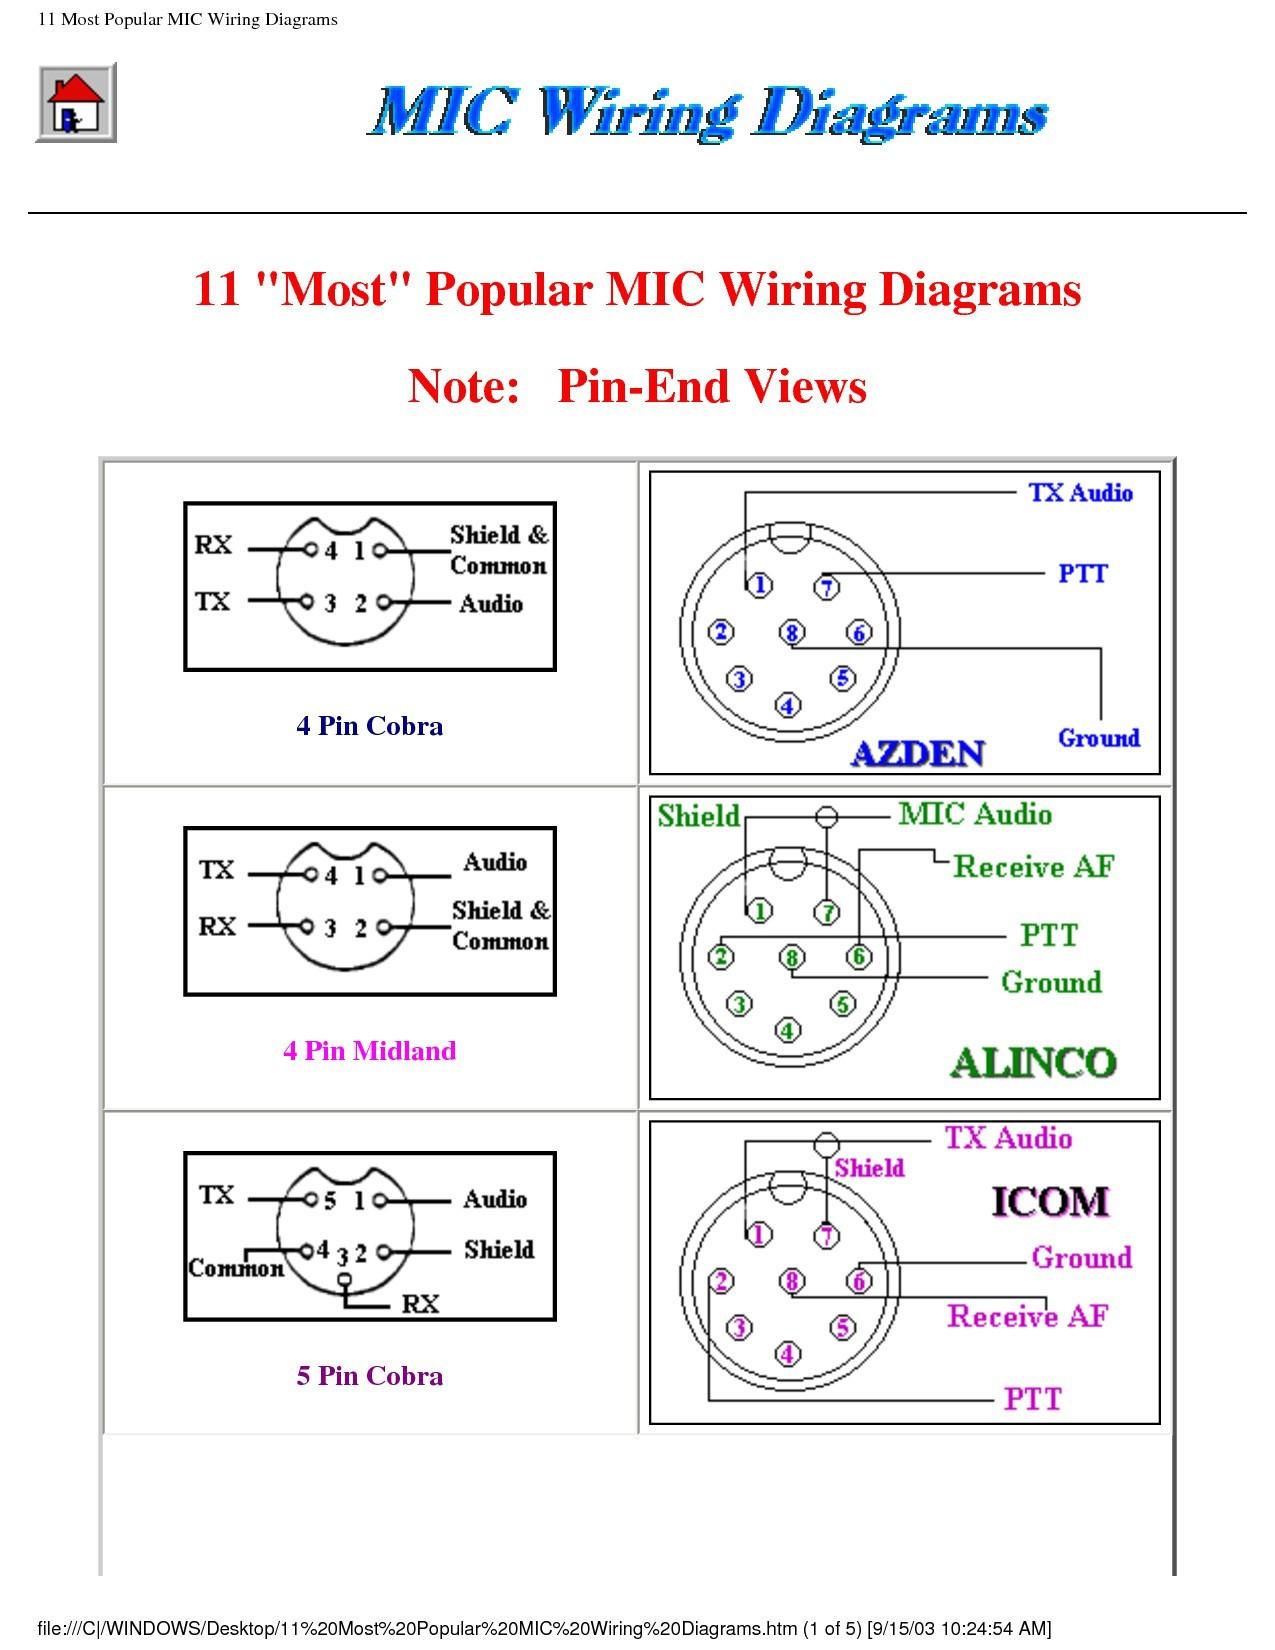 Radio S Cb Radio Mic Wiring   Wiring Diagram on